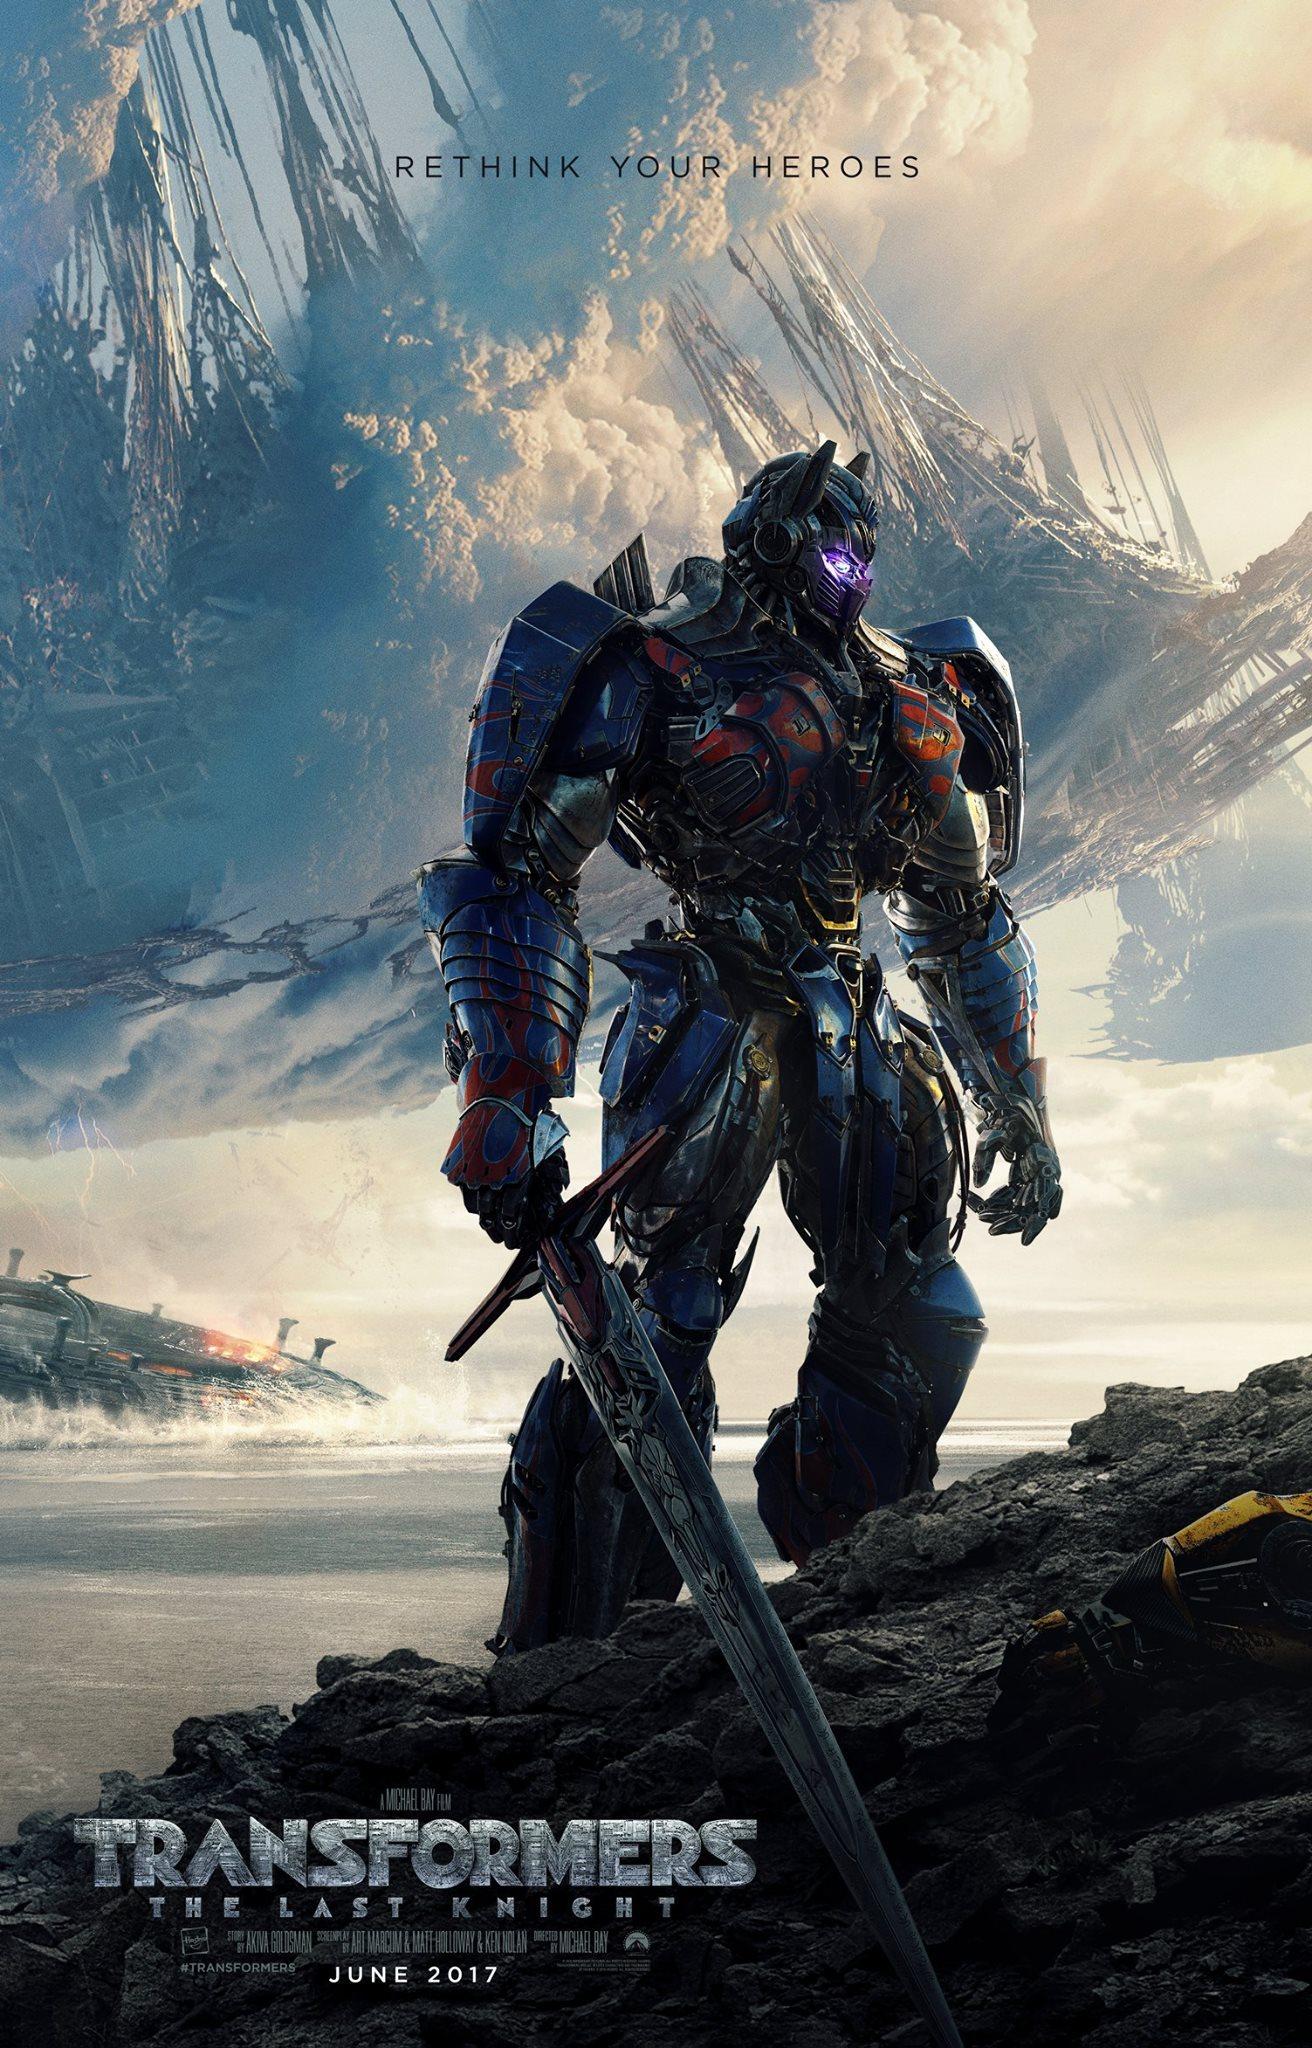 """Transformers: The Last Knight"" 슈퍼볼 예고.."